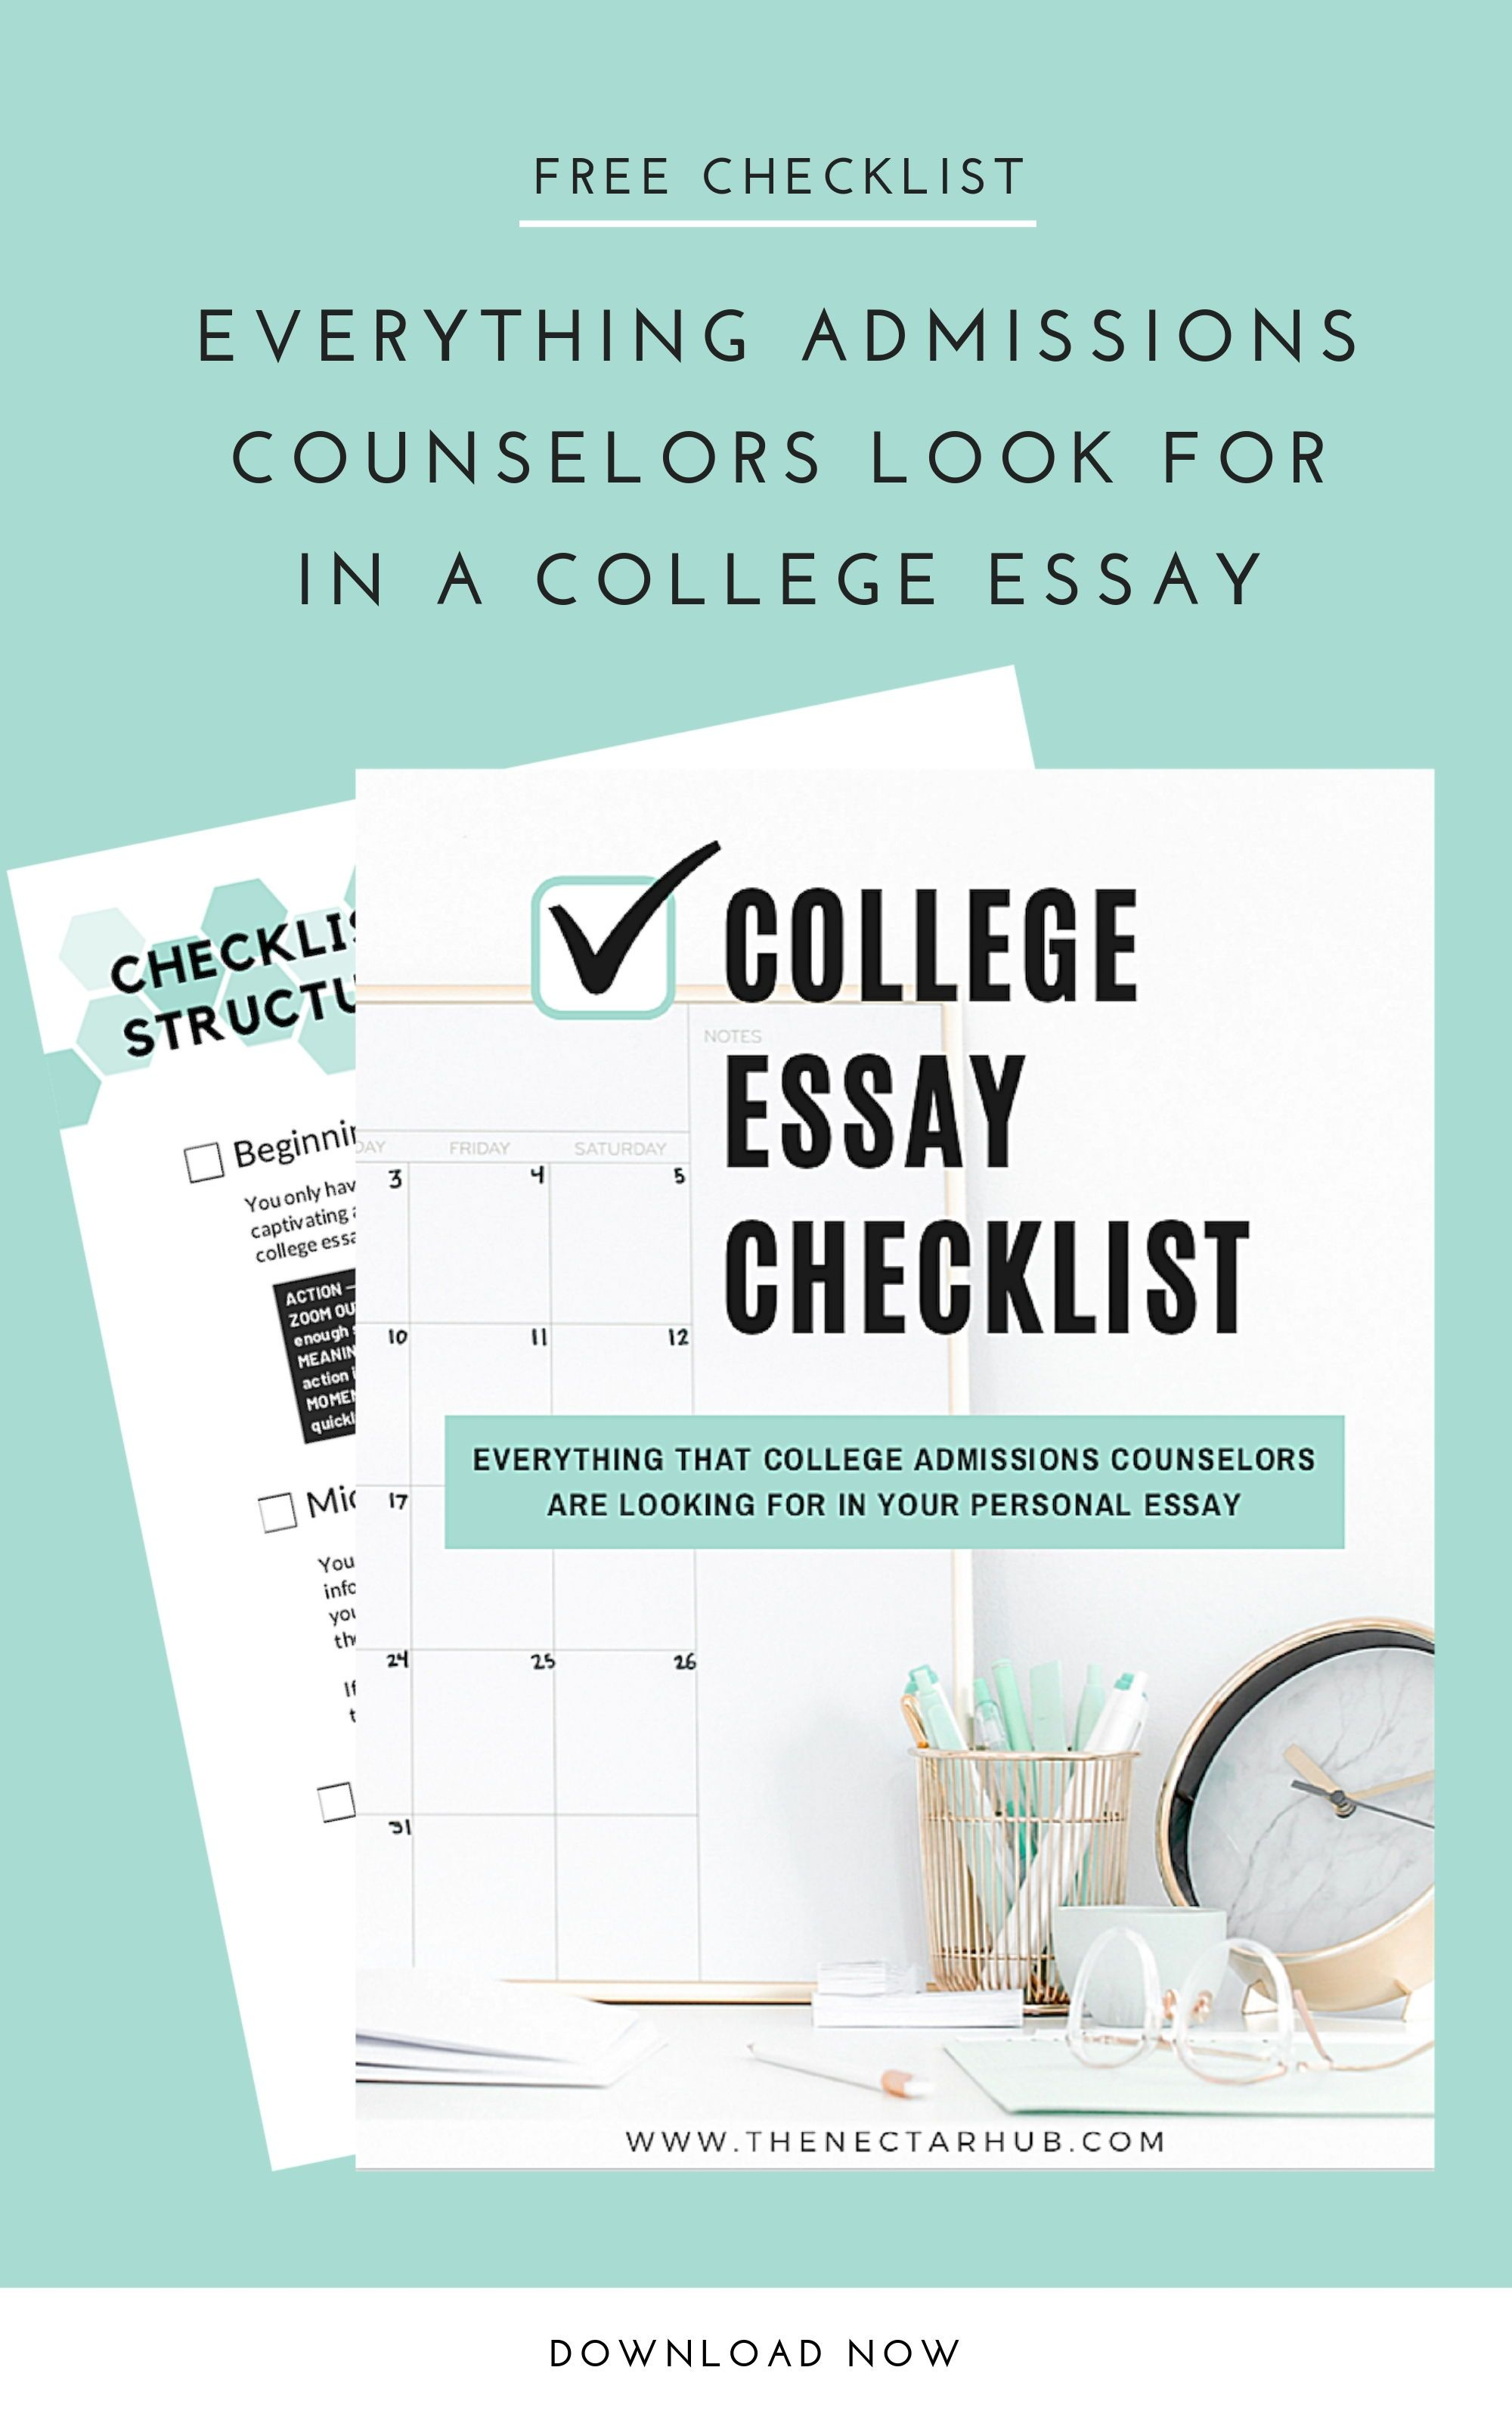 College application essay help online